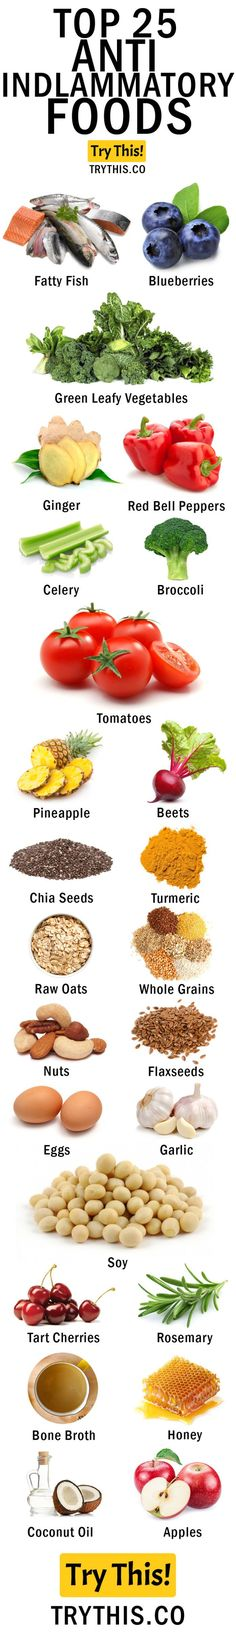 Top 25 Anti-Inflammatory Foods